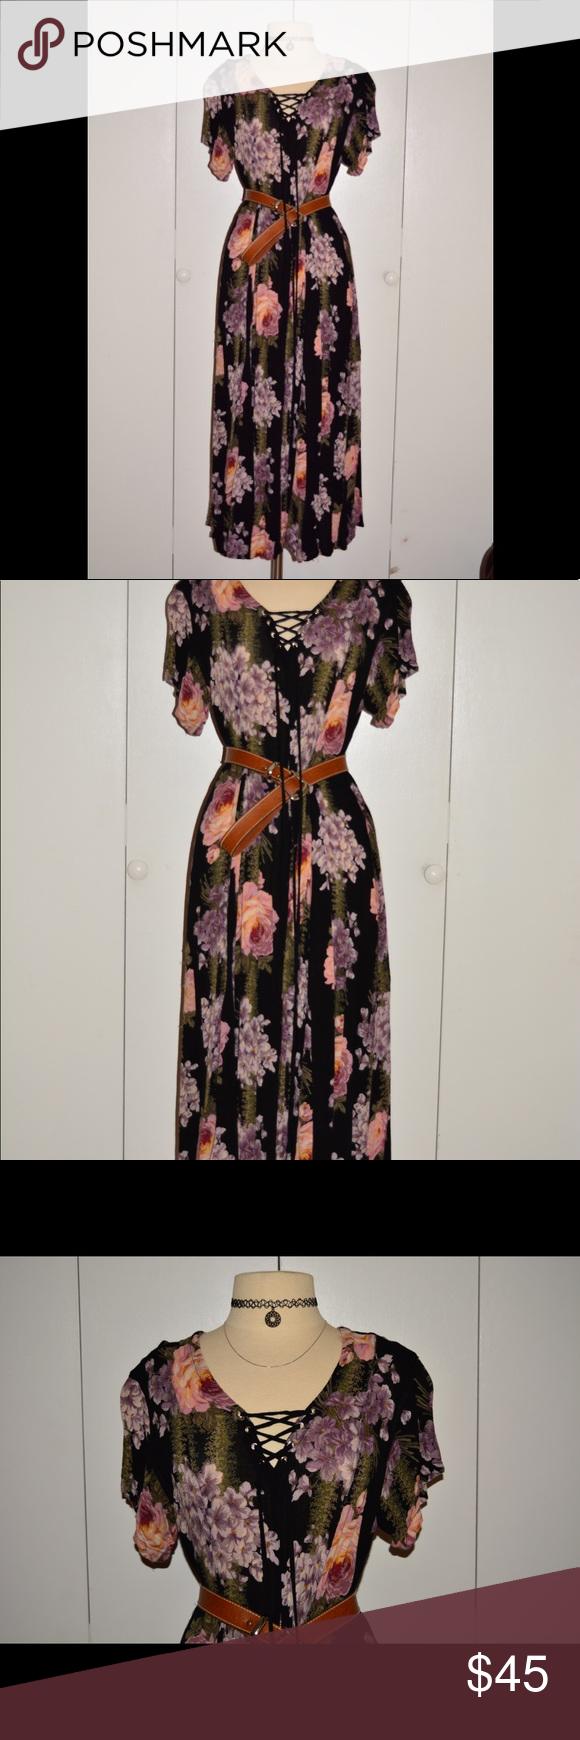 Vintage Floral Maxi Dress Floral Maxi Dress Vintage Dresses Floral Maxi [ 1740 x 580 Pixel ]